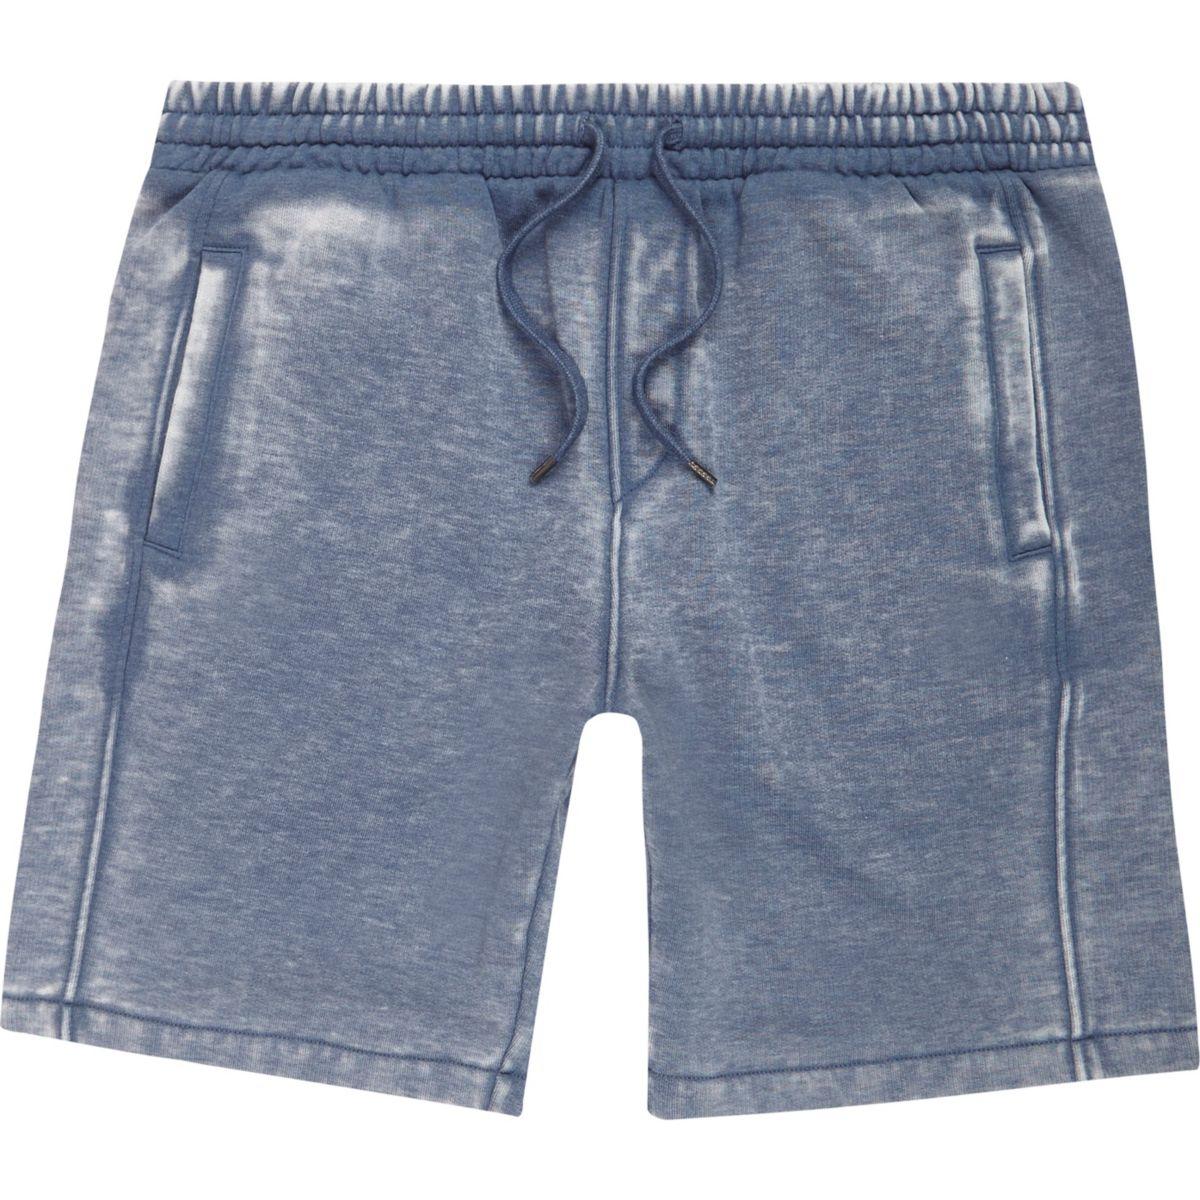 Navy blue burnout shorts